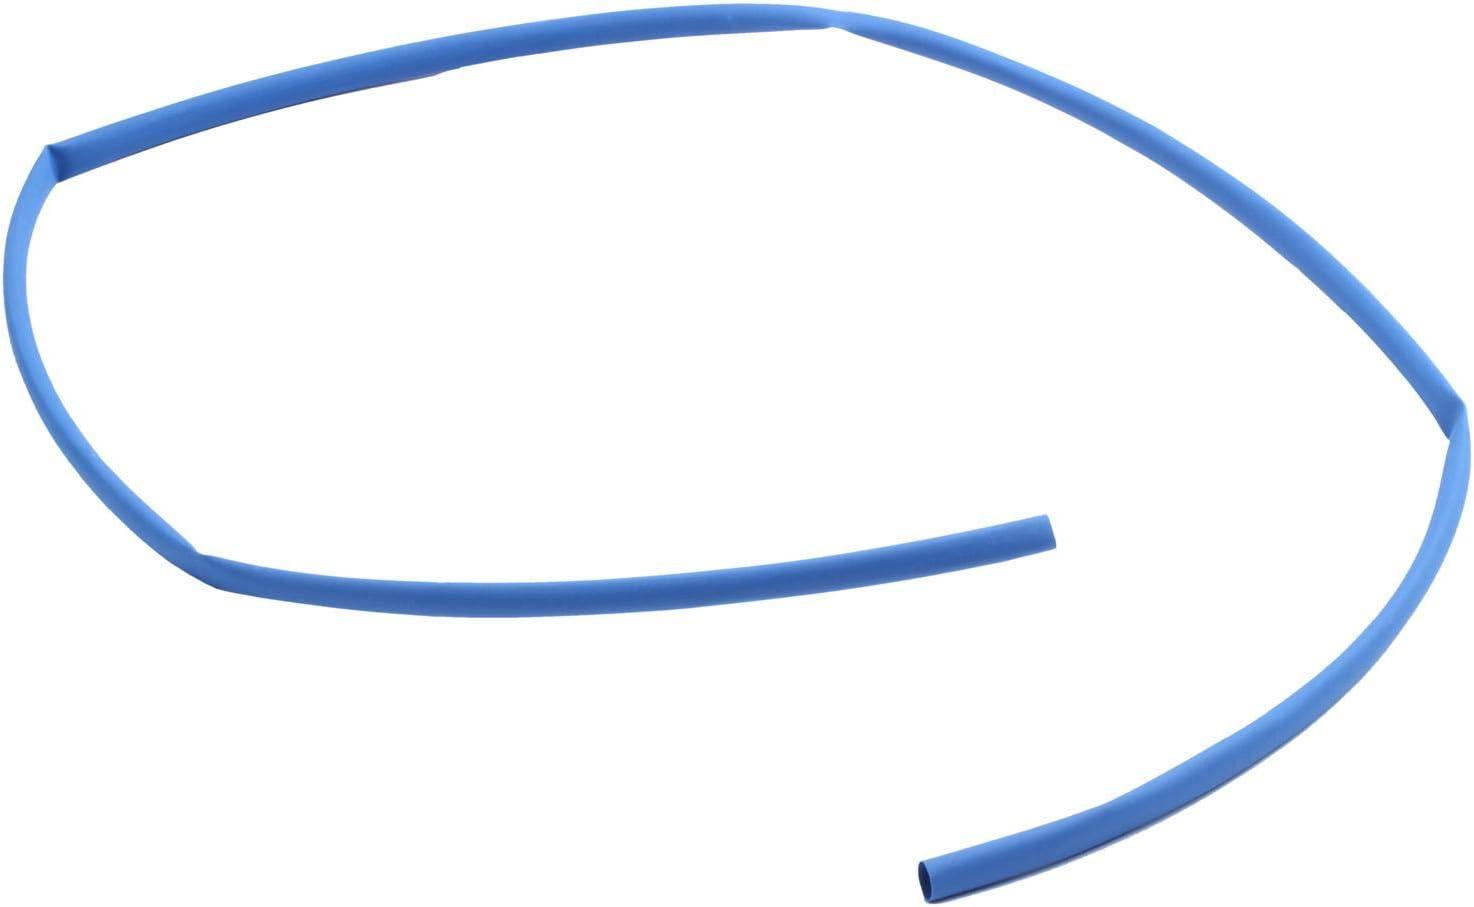 1 Gaine en Polyol/éFine Gaine Thermor/éTractable Tube Gaine Gaine Enveloppe SNOWINSPRING 8.0MM 2